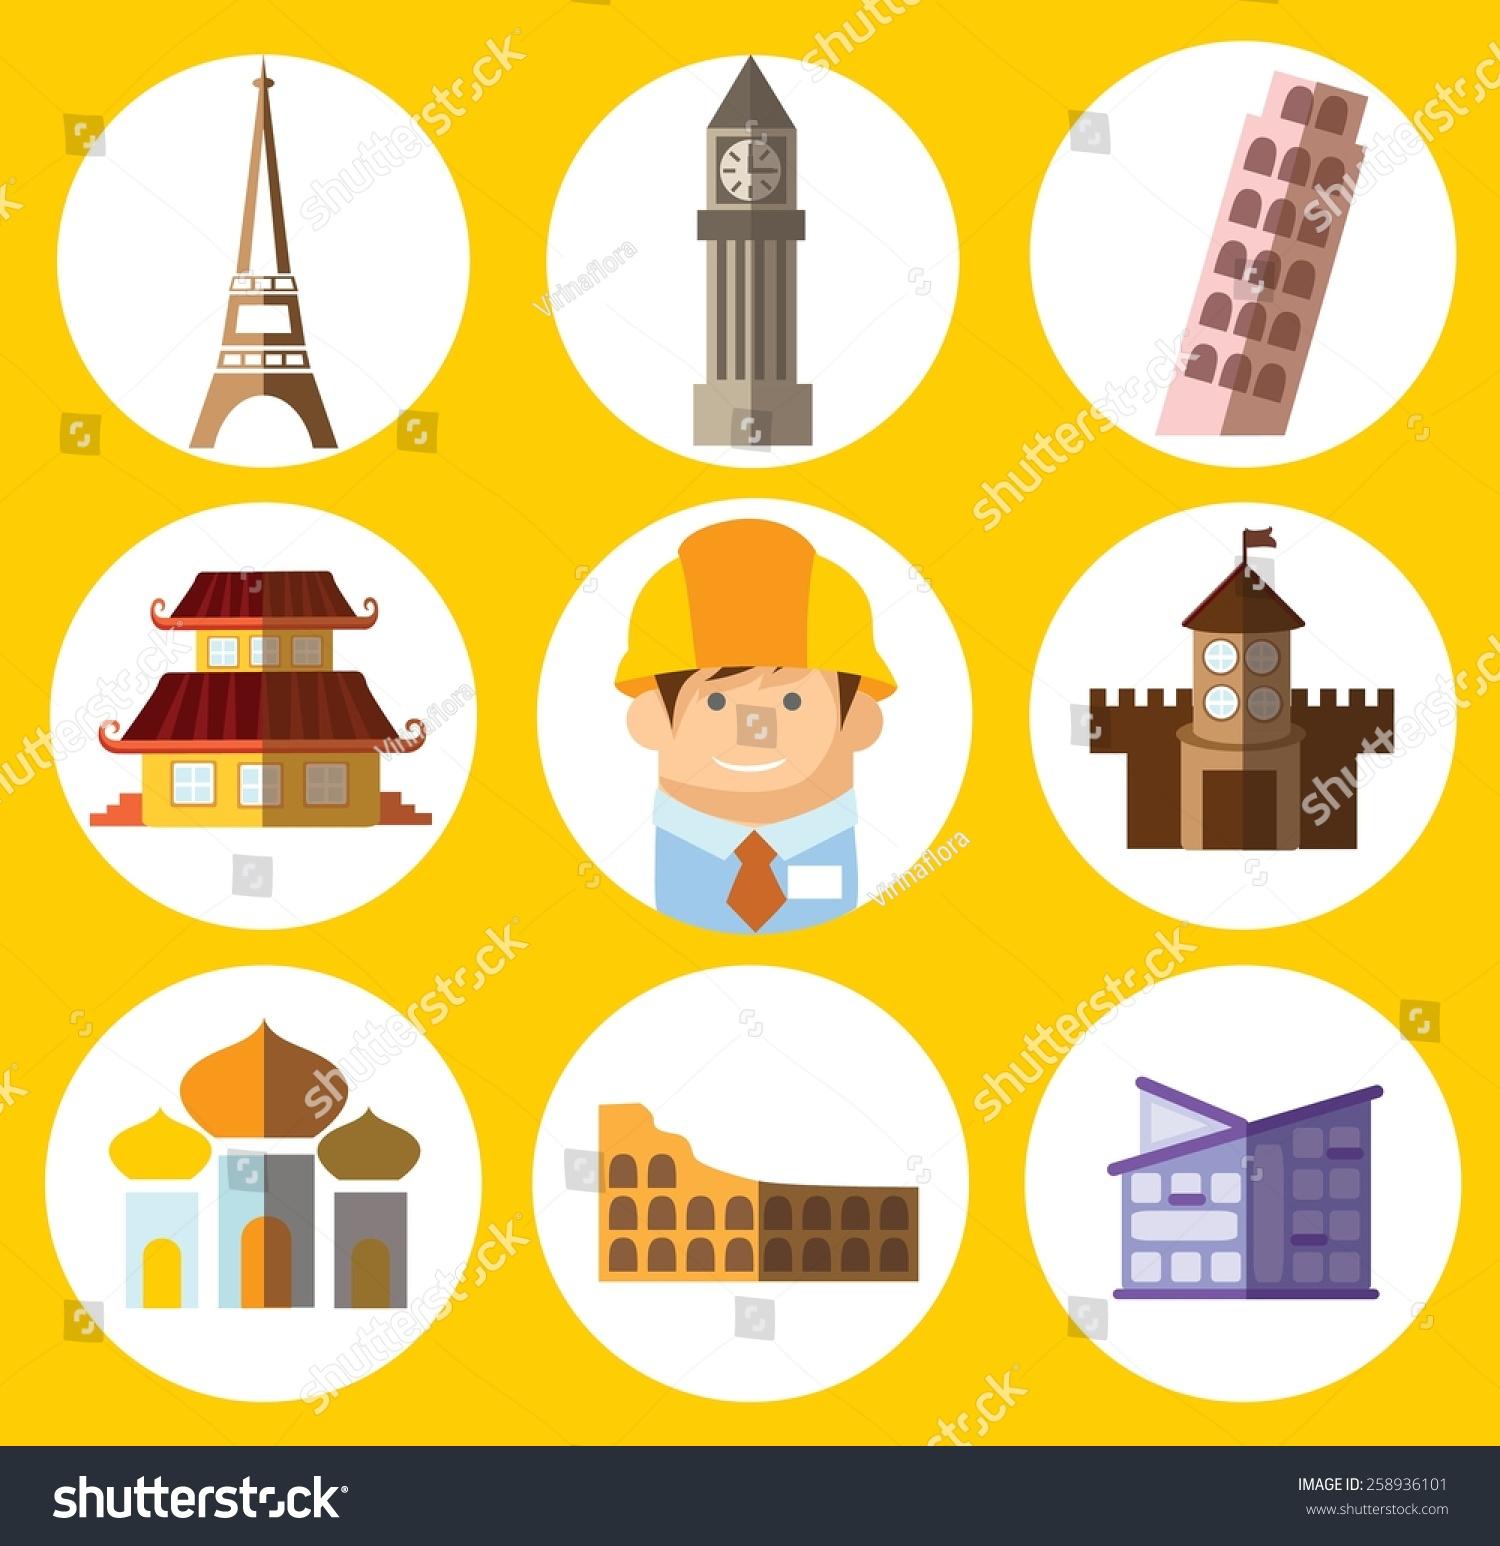 builder concept flat icon career infographic design elements vector illustration